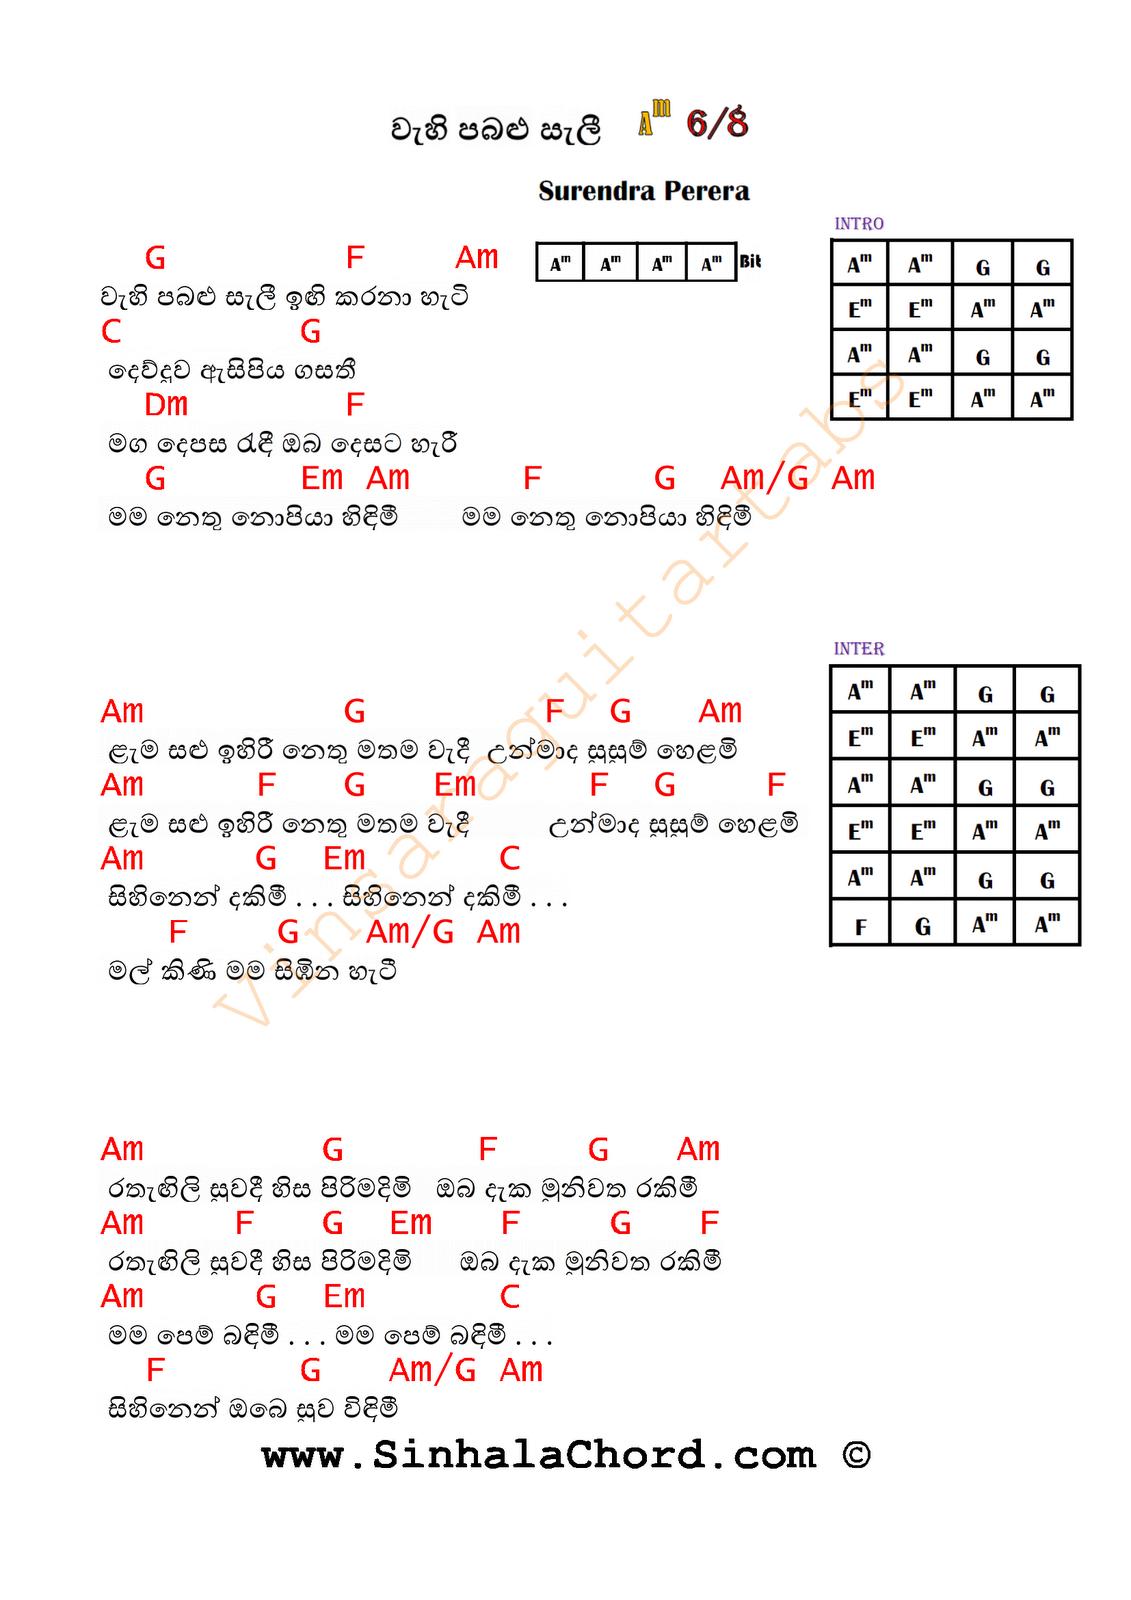 Guitar chords for sinhala